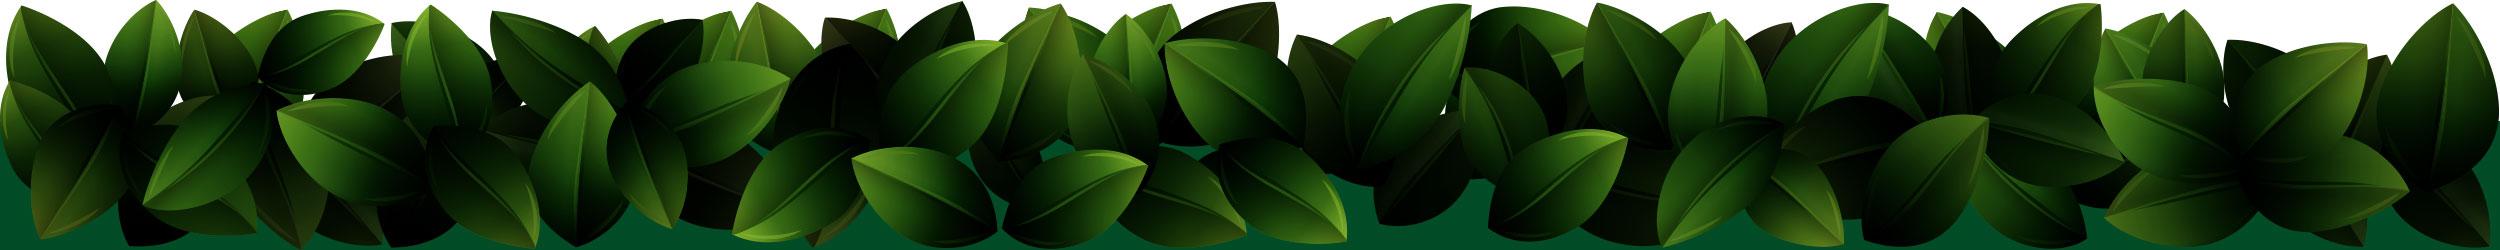 leaf-border-3